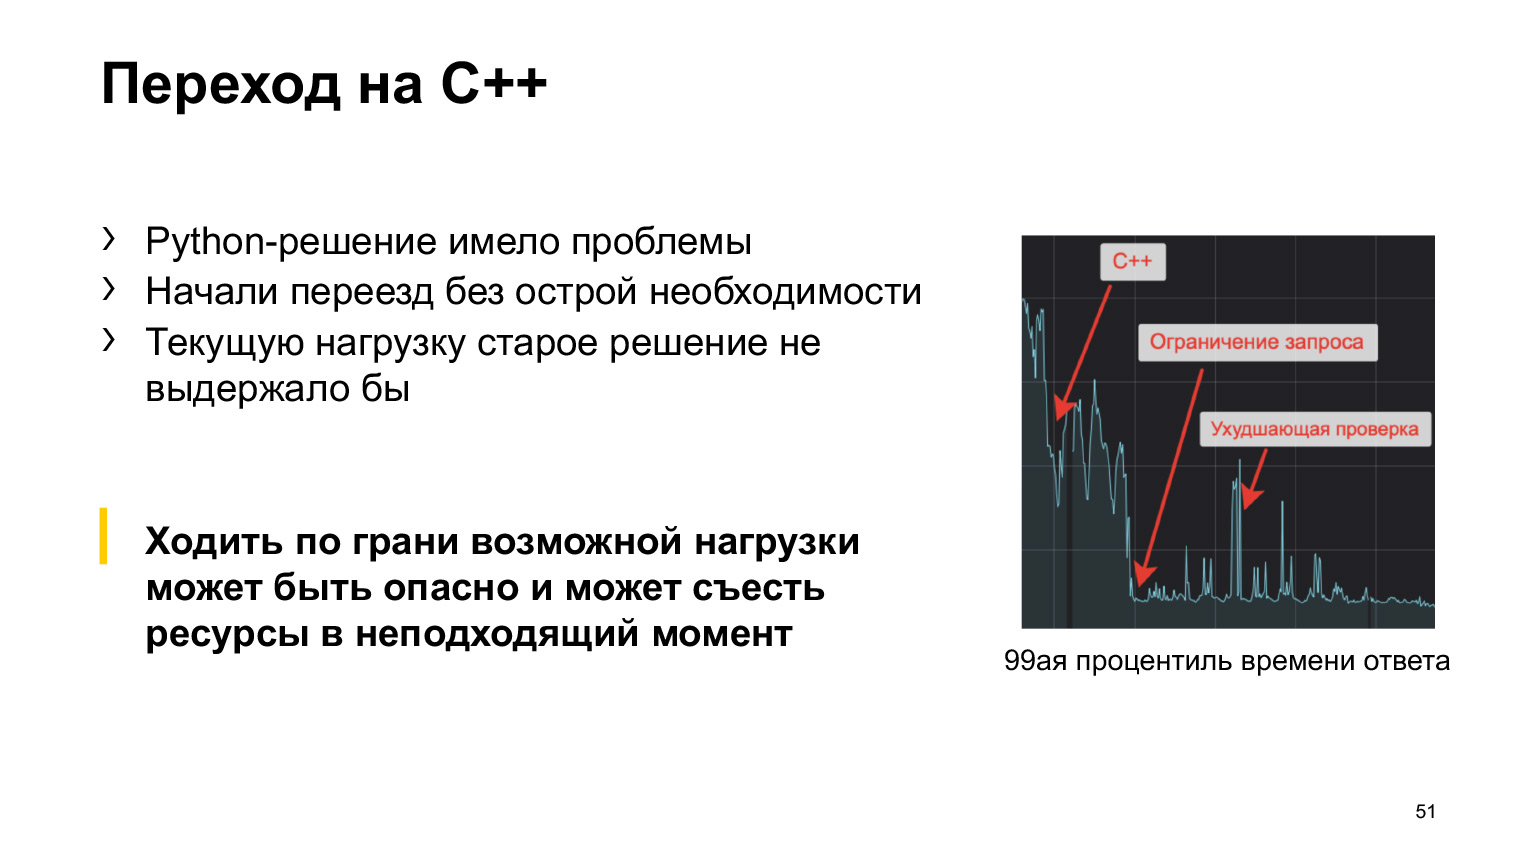 Как коронавирус повлиял на ML-проекты Такси, Еды и Лавки. Доклад Яндекса - 18